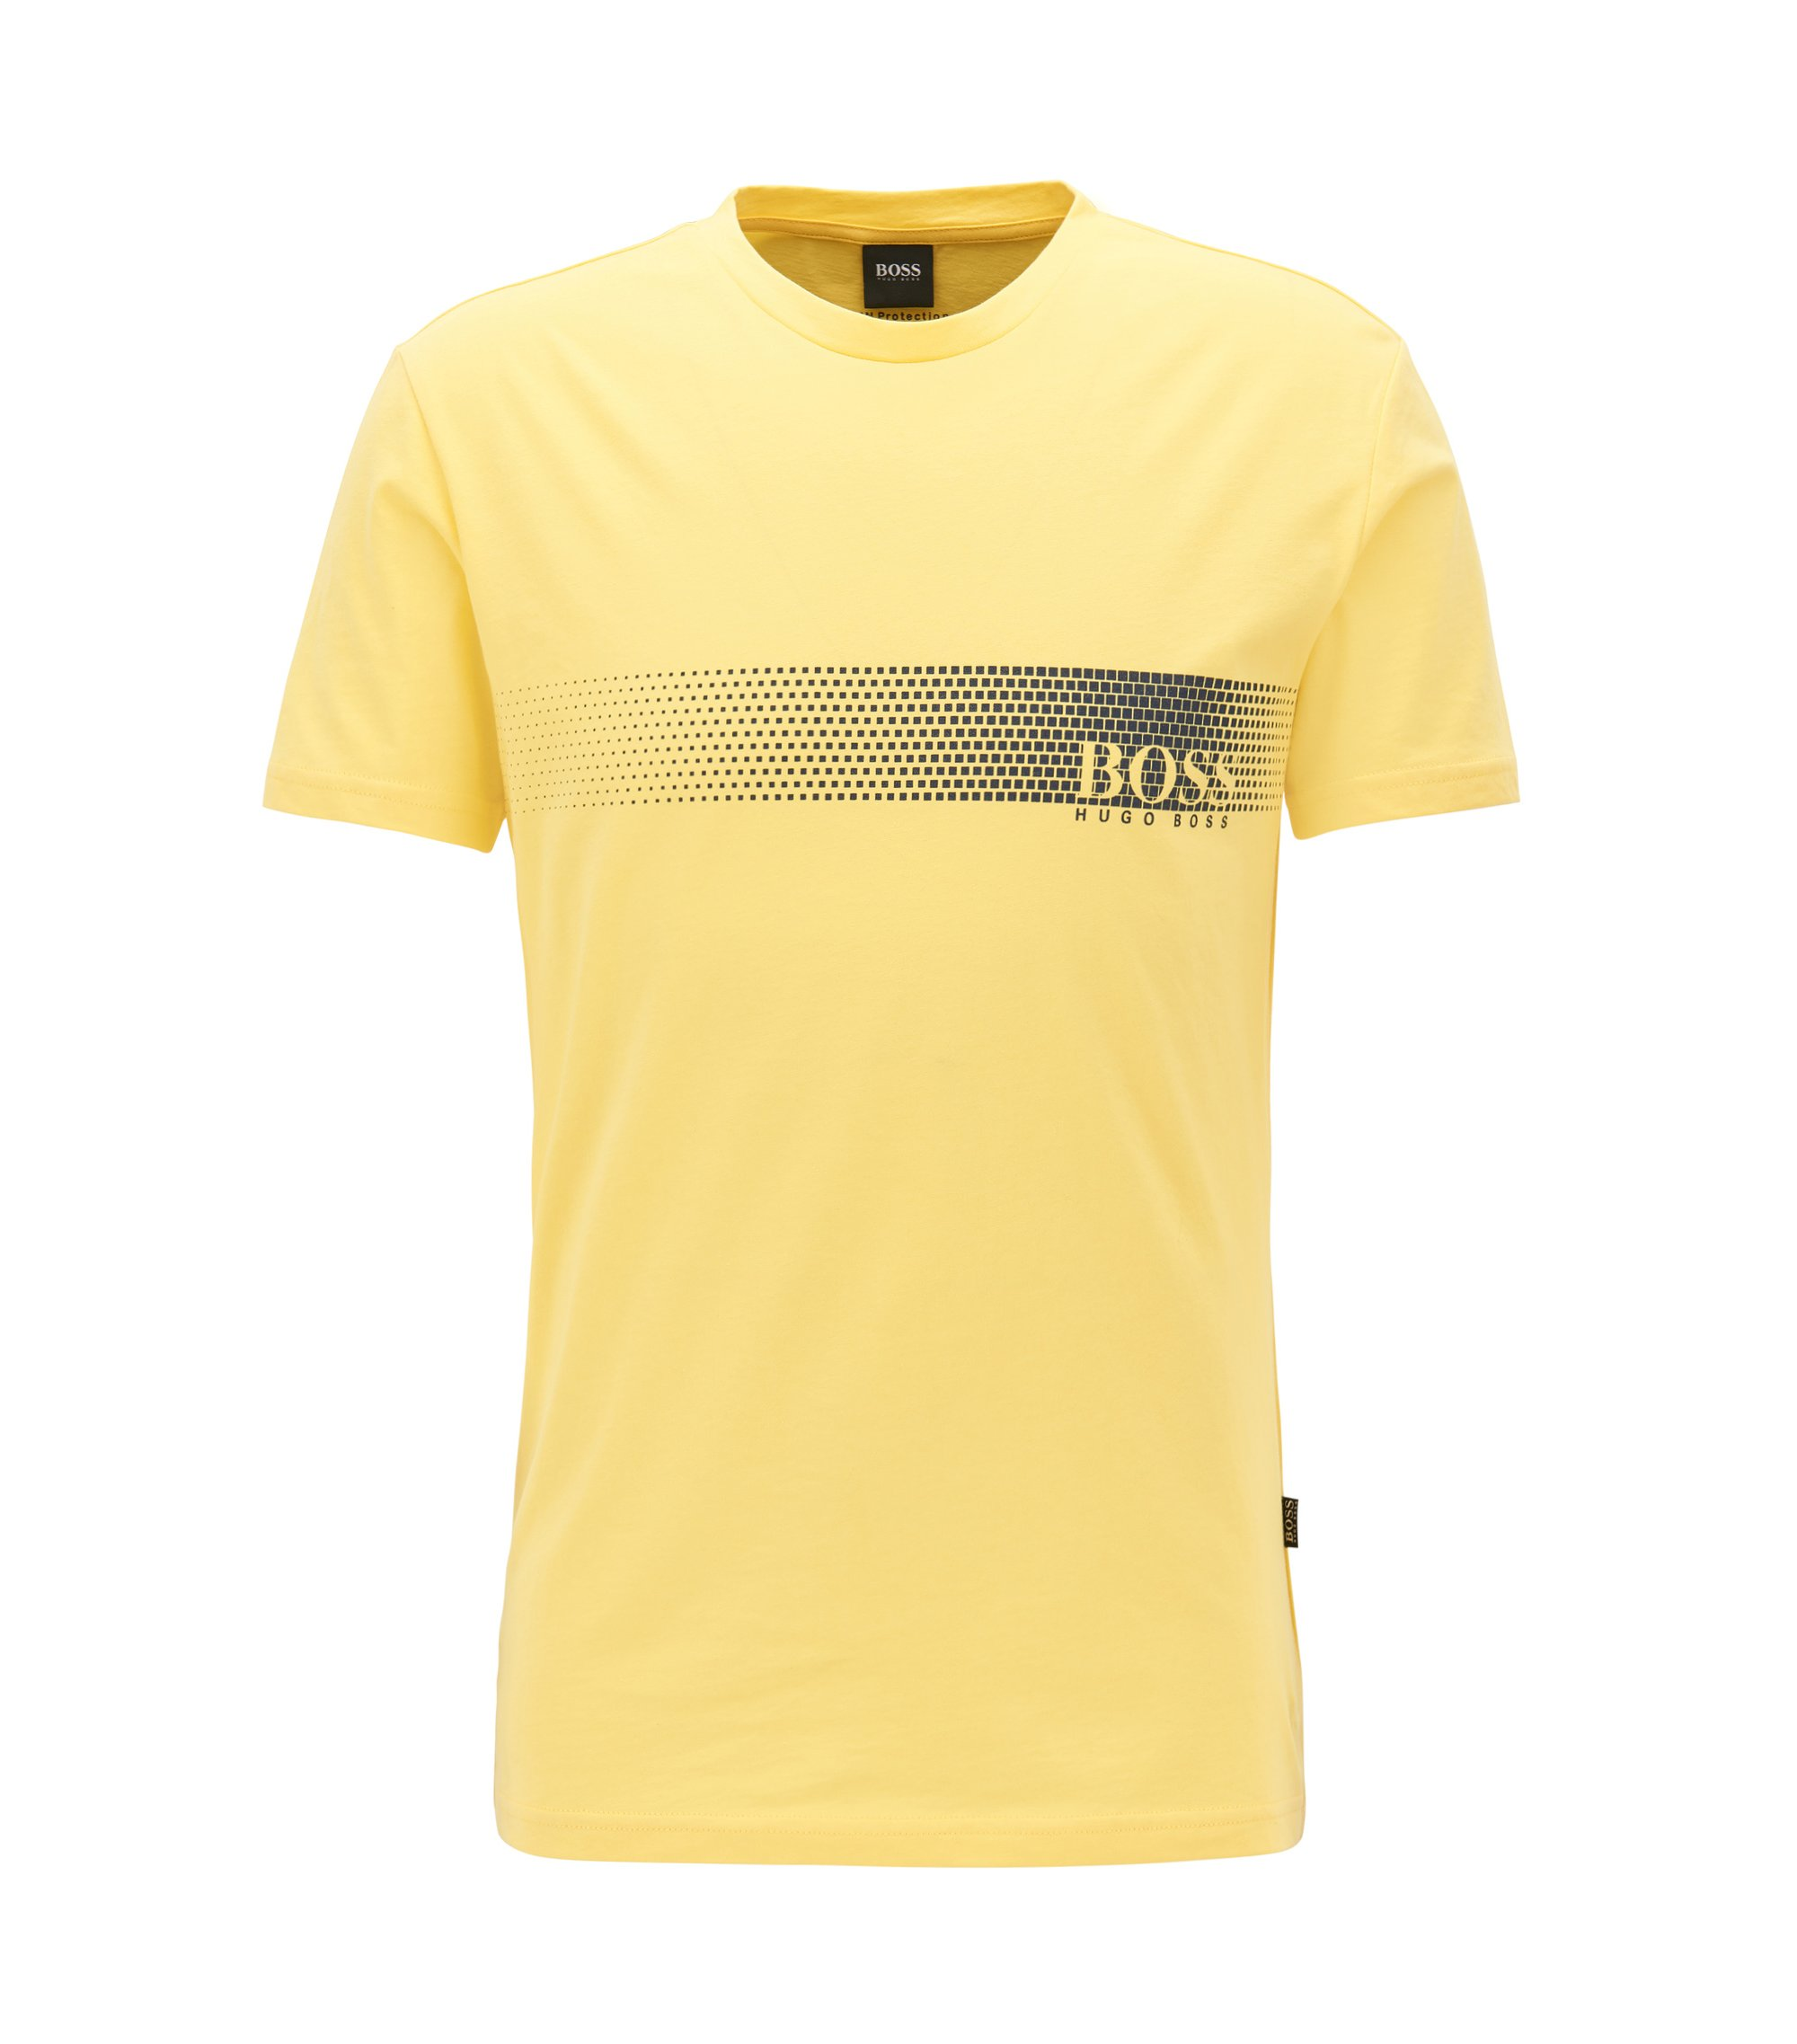 Sunsafe logo T-shirt in cotton, Yellow